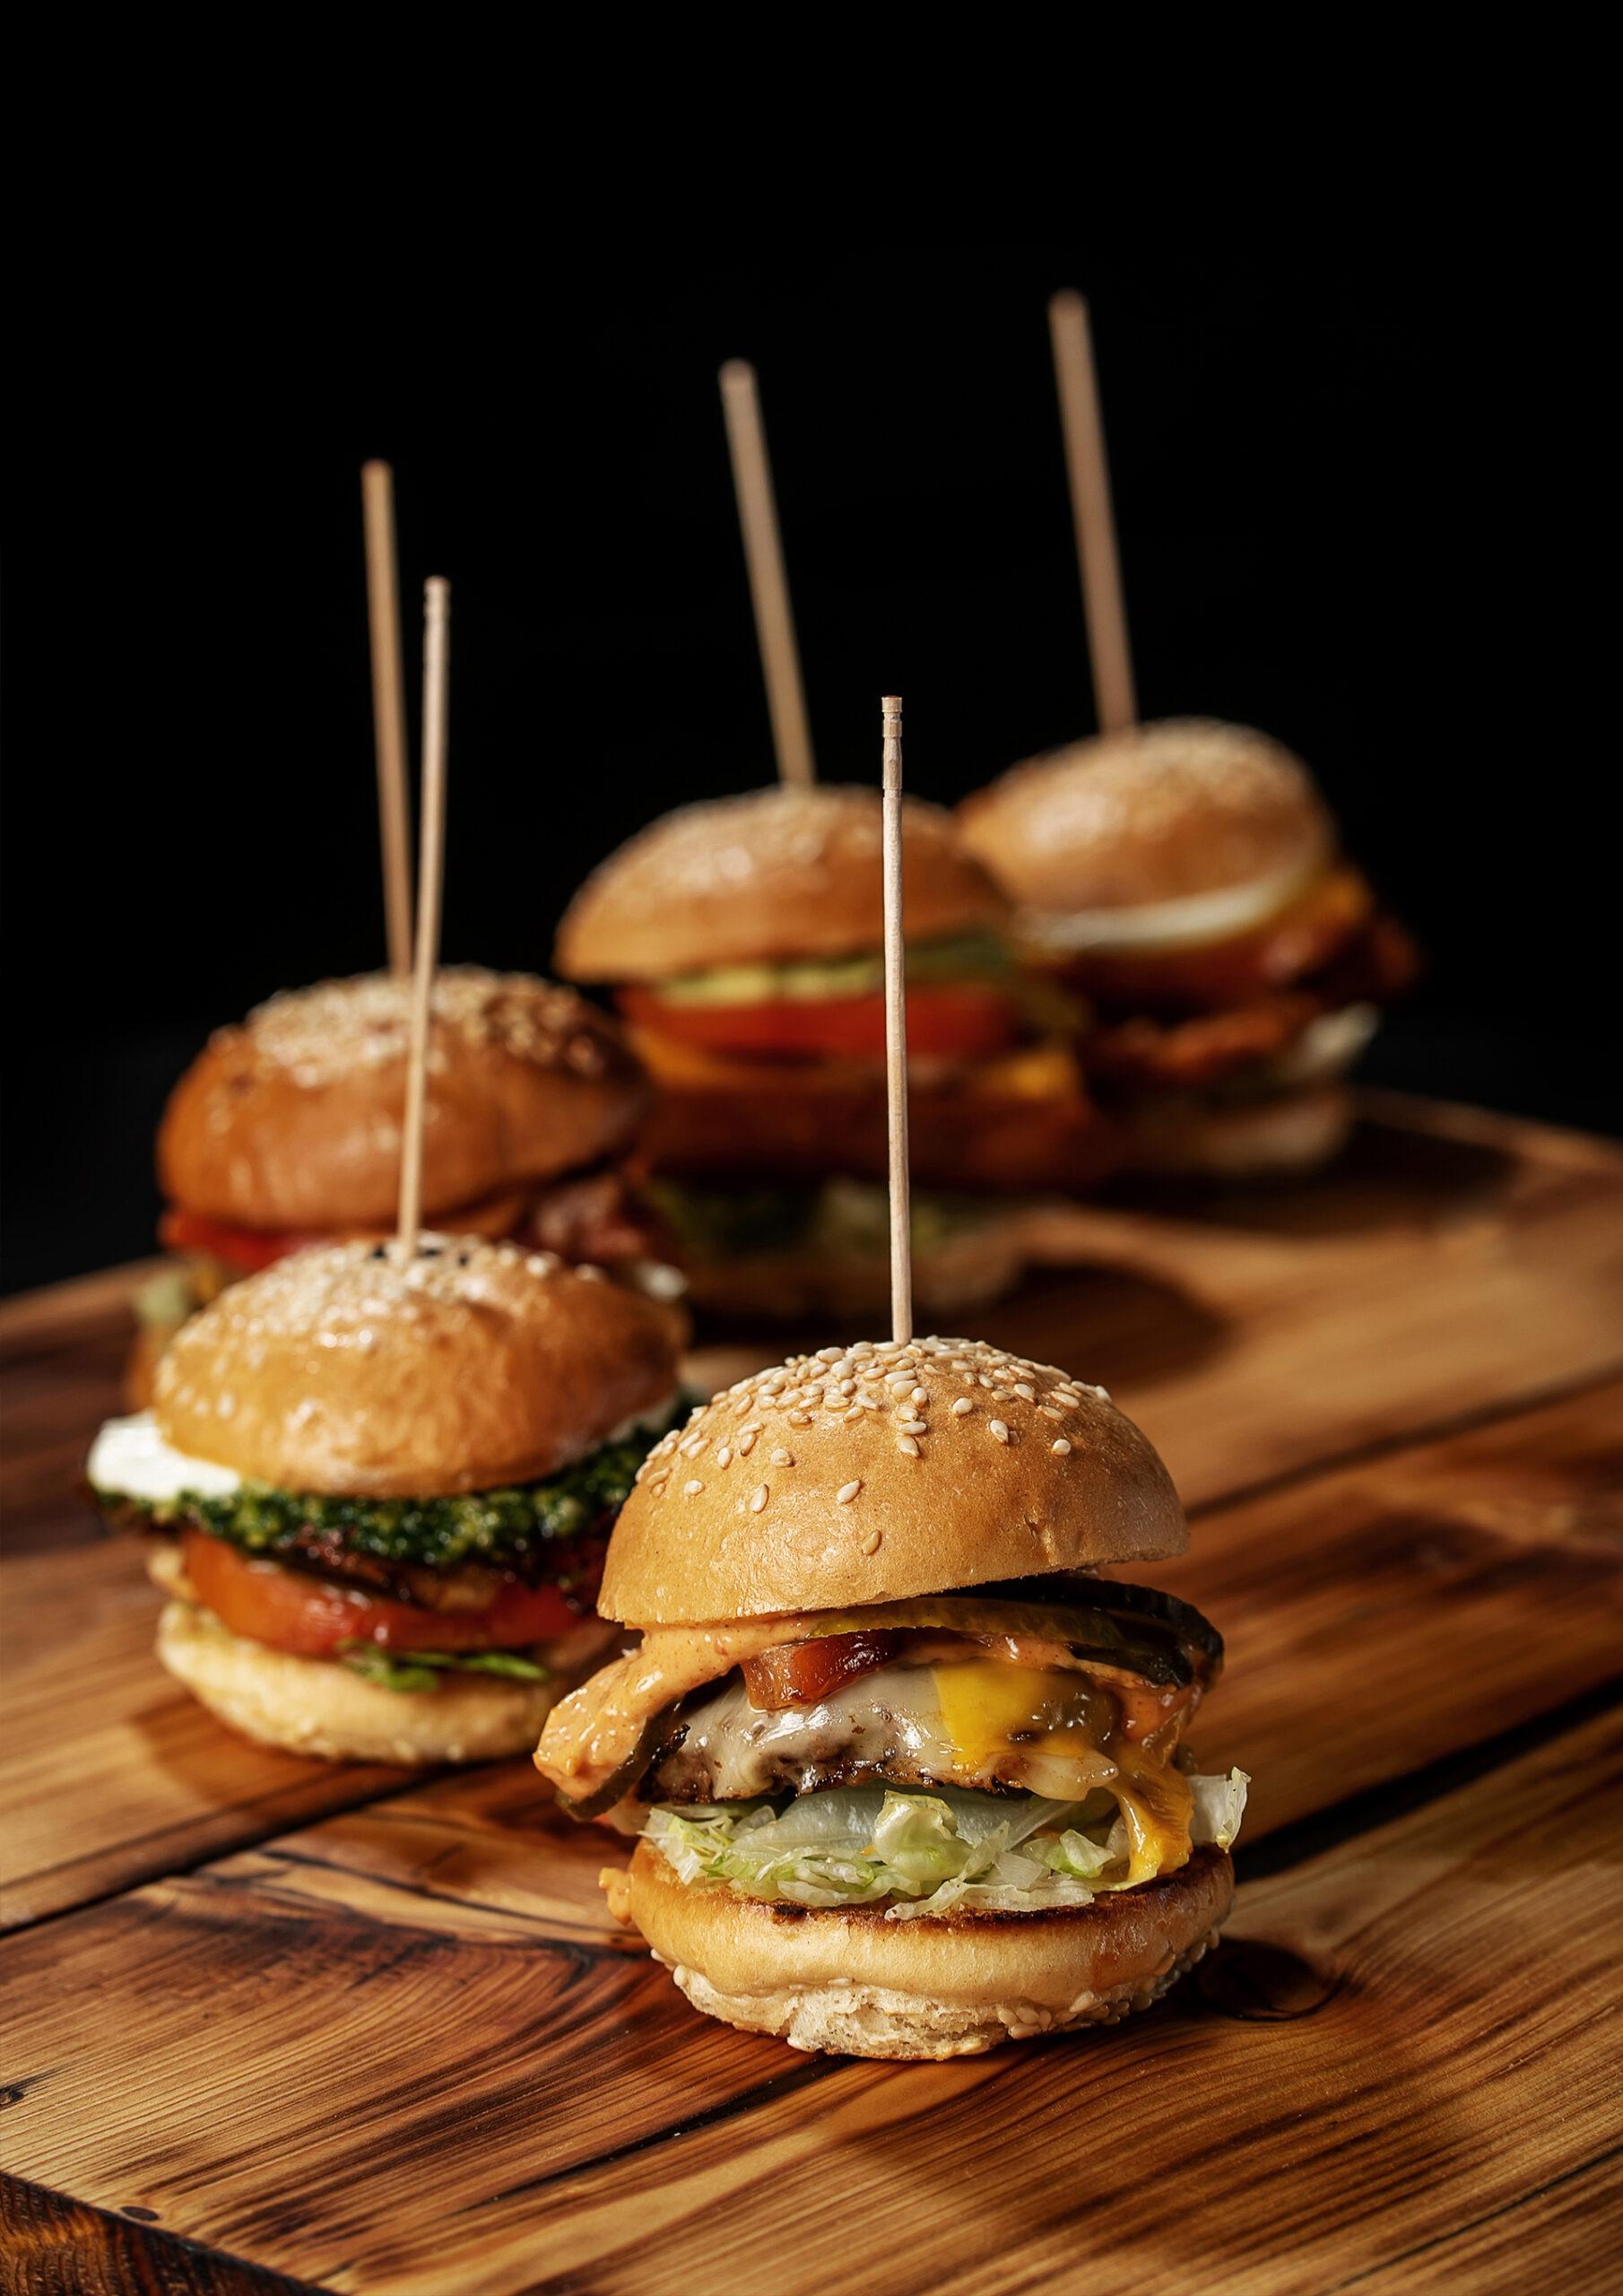 Burgerglück Catering Menü Hamburgerplatte